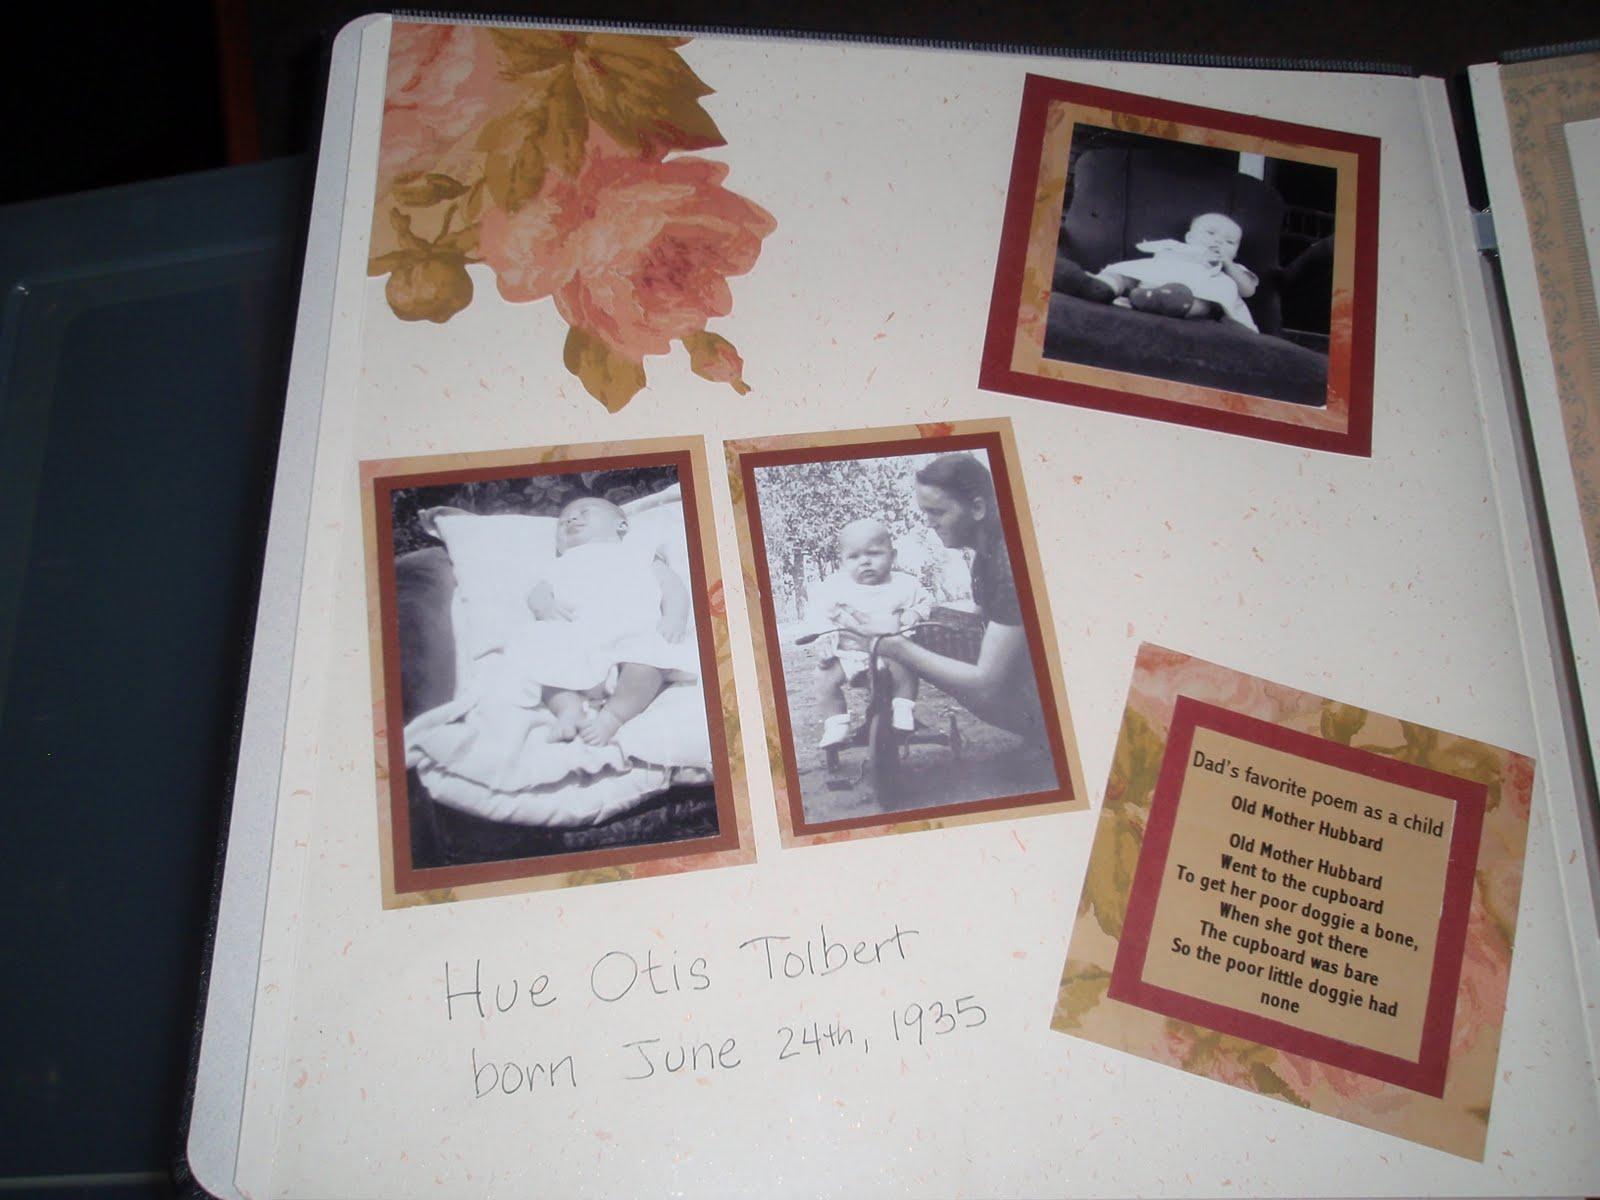 50th Wedding Anniversary Scrapbook Albums